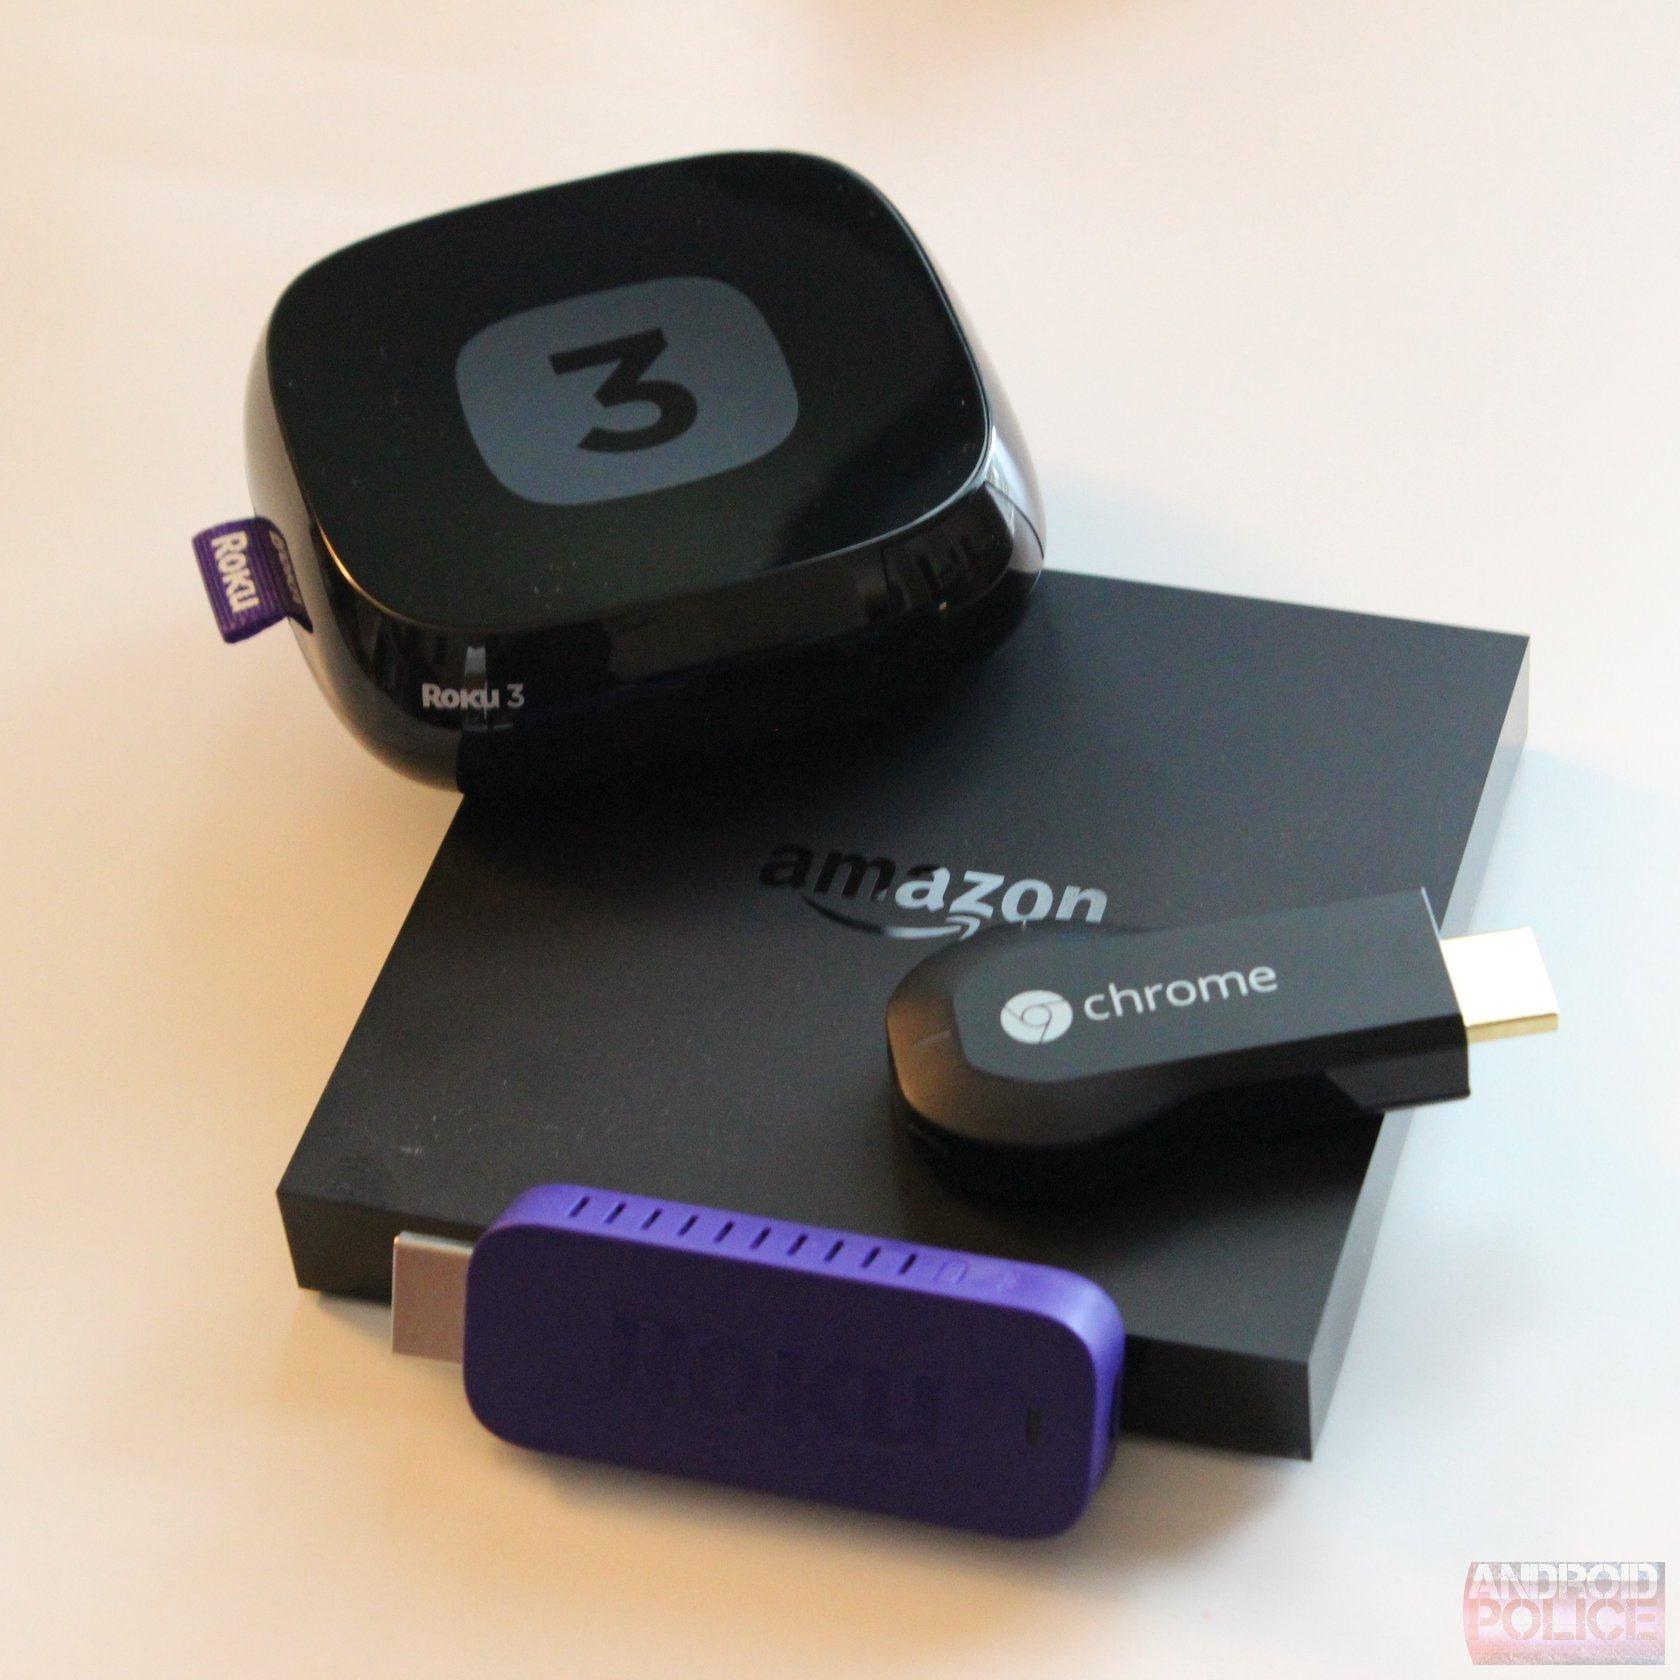 Media Streamer Boxes